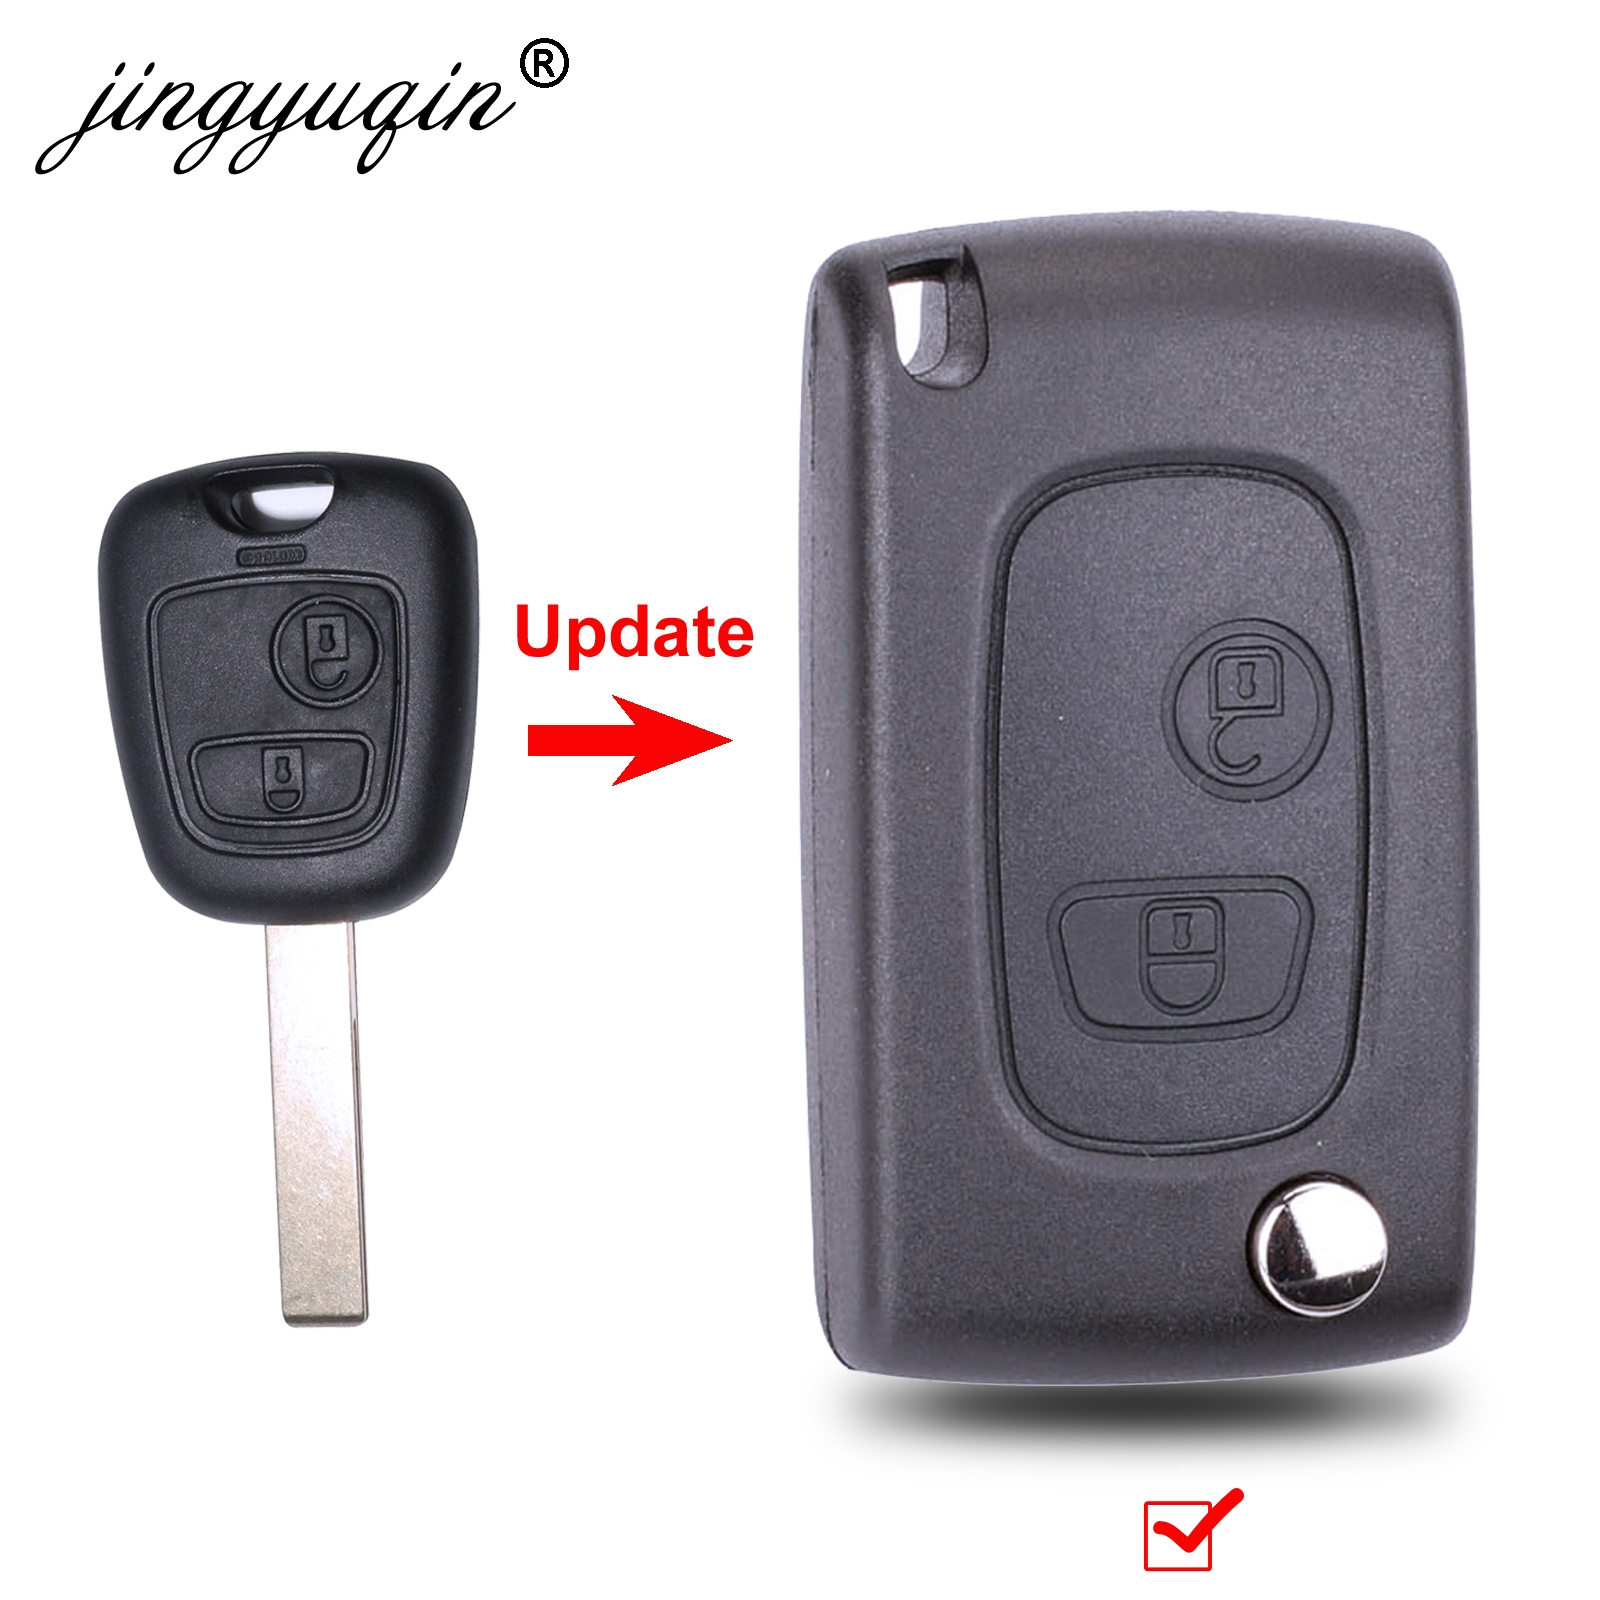 jingyuqin Modified Flip Folding Remote Key Shell fit for PEUGEOT 307 607 207 407 2BTN Key Case Fob  VA2/HU83 Bladejingyuqin Modified Flip Folding Remote Key Shell fit for PEUGEOT 307 607 207 407 2BTN Key Case Fob  VA2/HU83 Blade